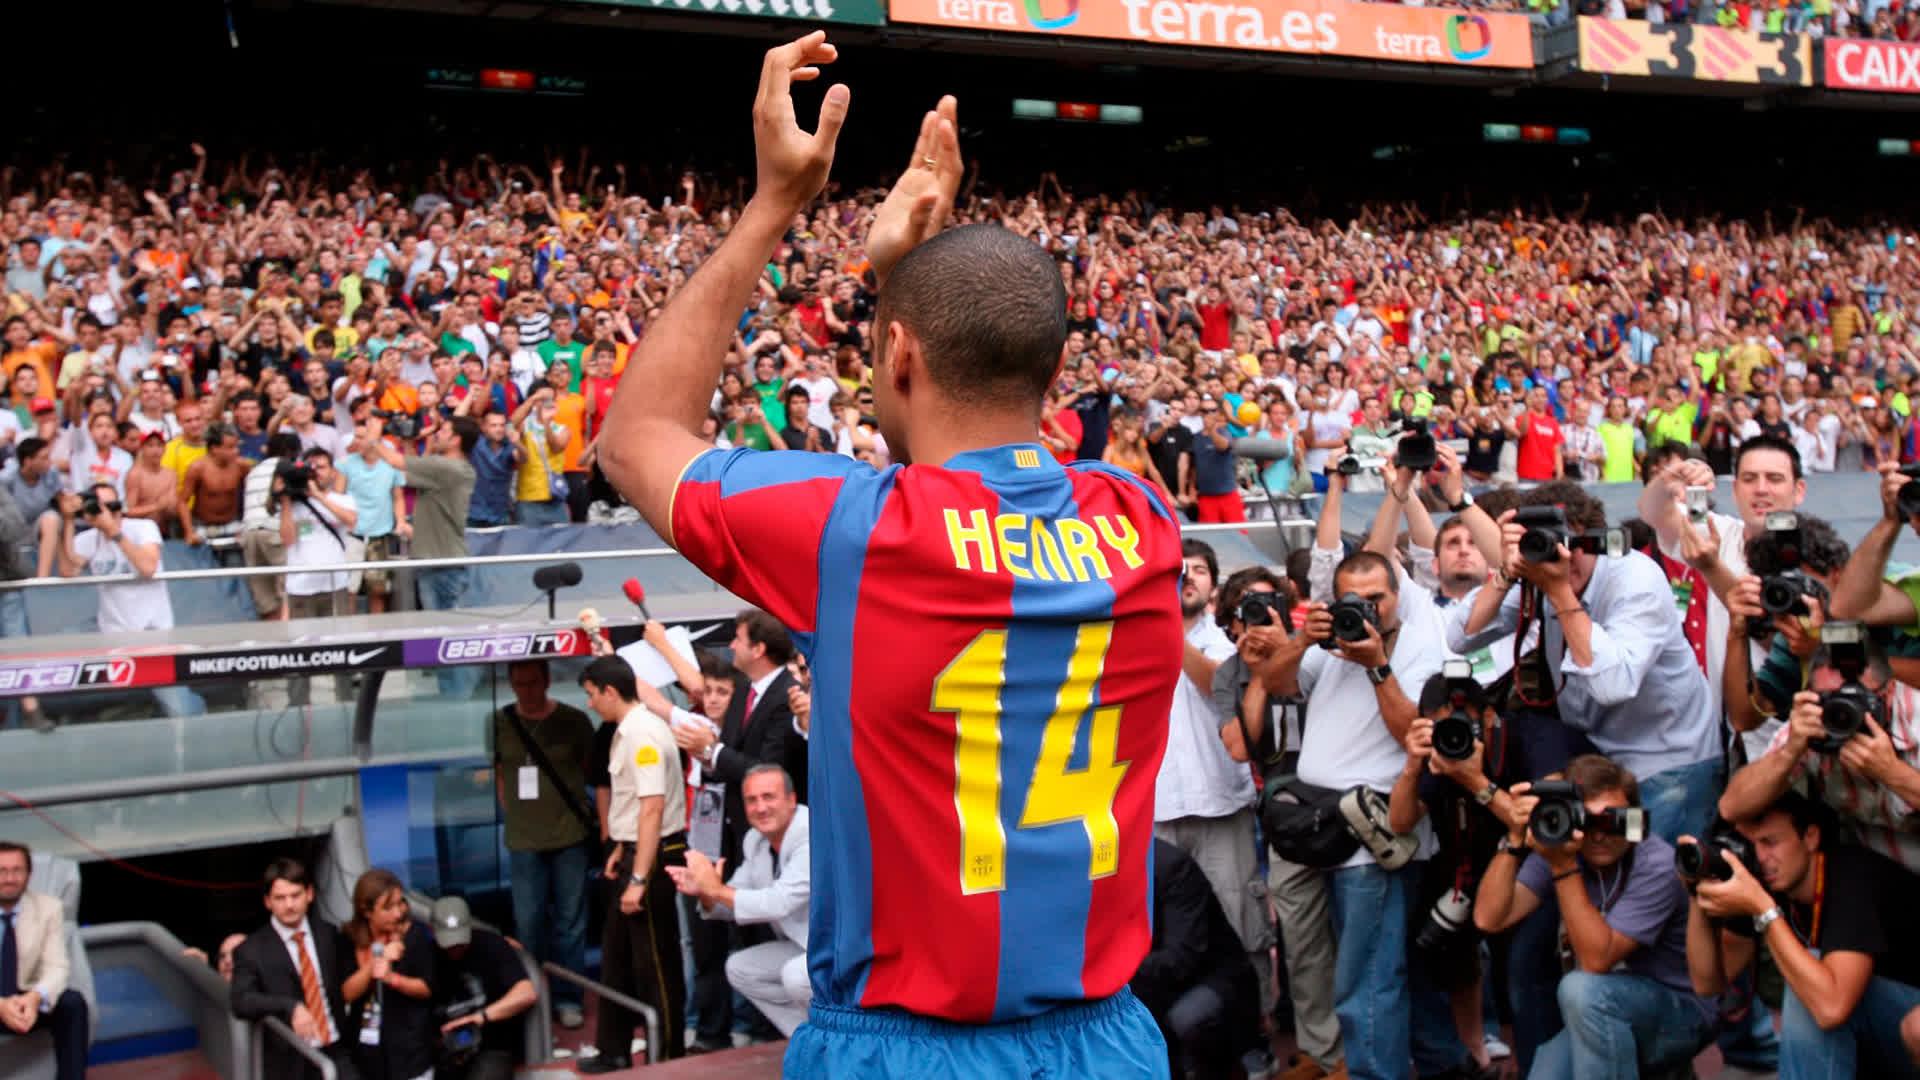 �� 2007 @ThierryHenry begins life at Barça ���� C'est magnifique! �� https://t.co/I8hfz0s2VA